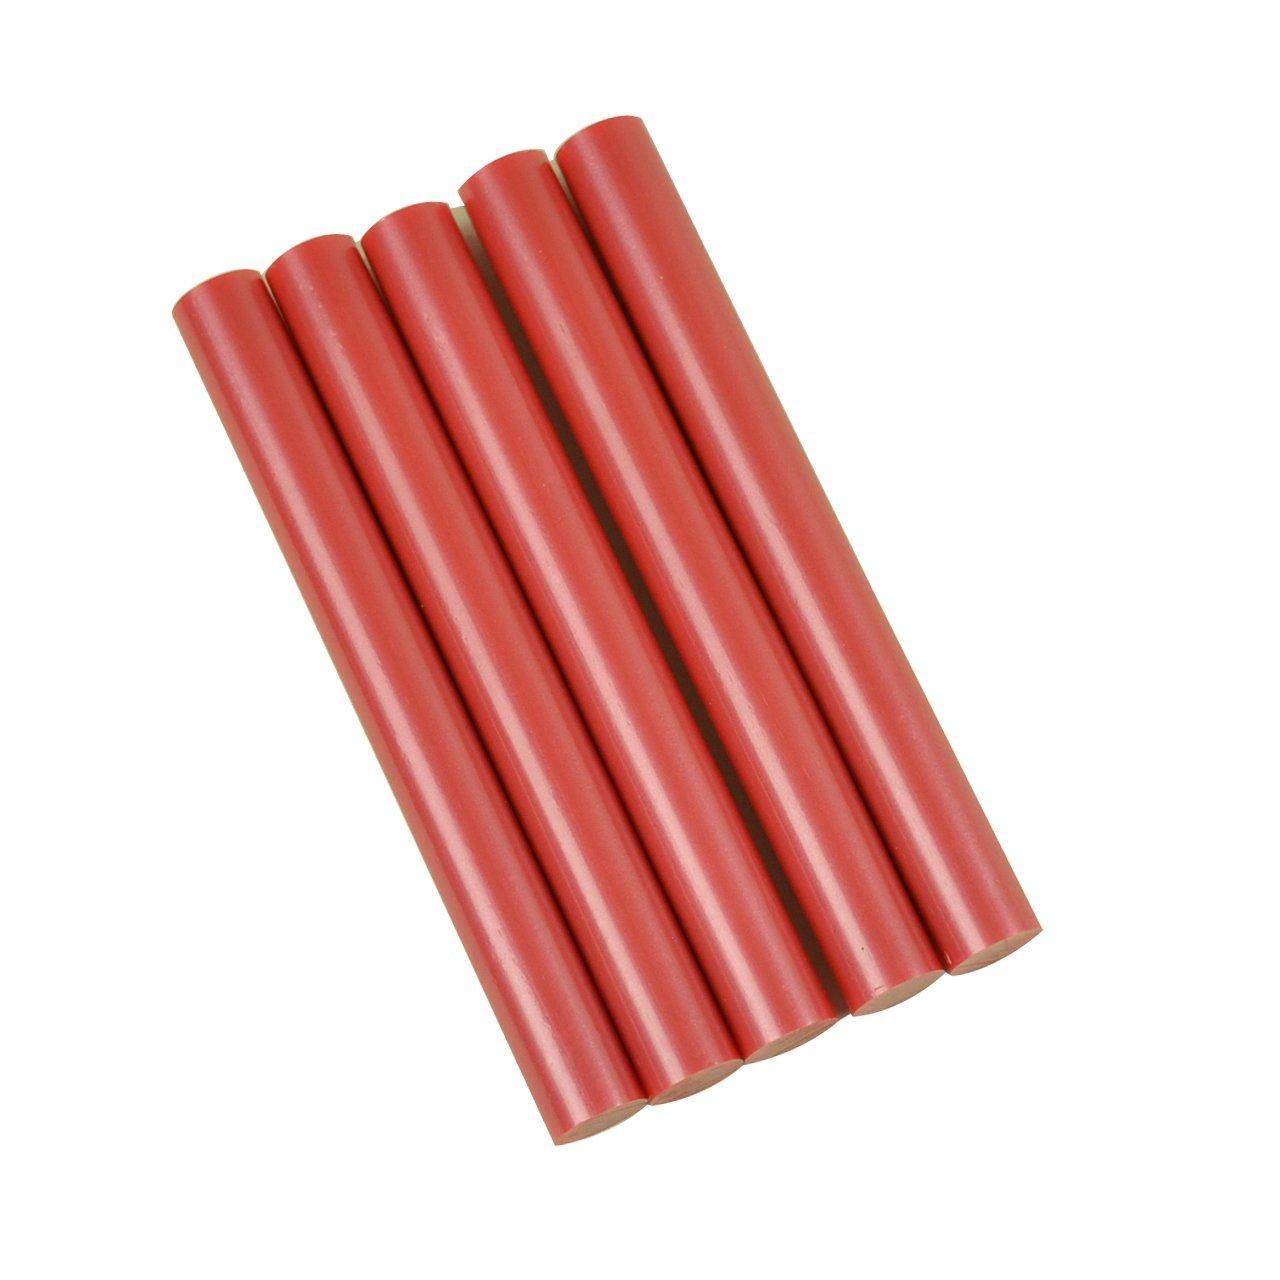 GlueSticksDirect Red Metallic Colored Glue Sticks 7/16 X 4 5 Sticks